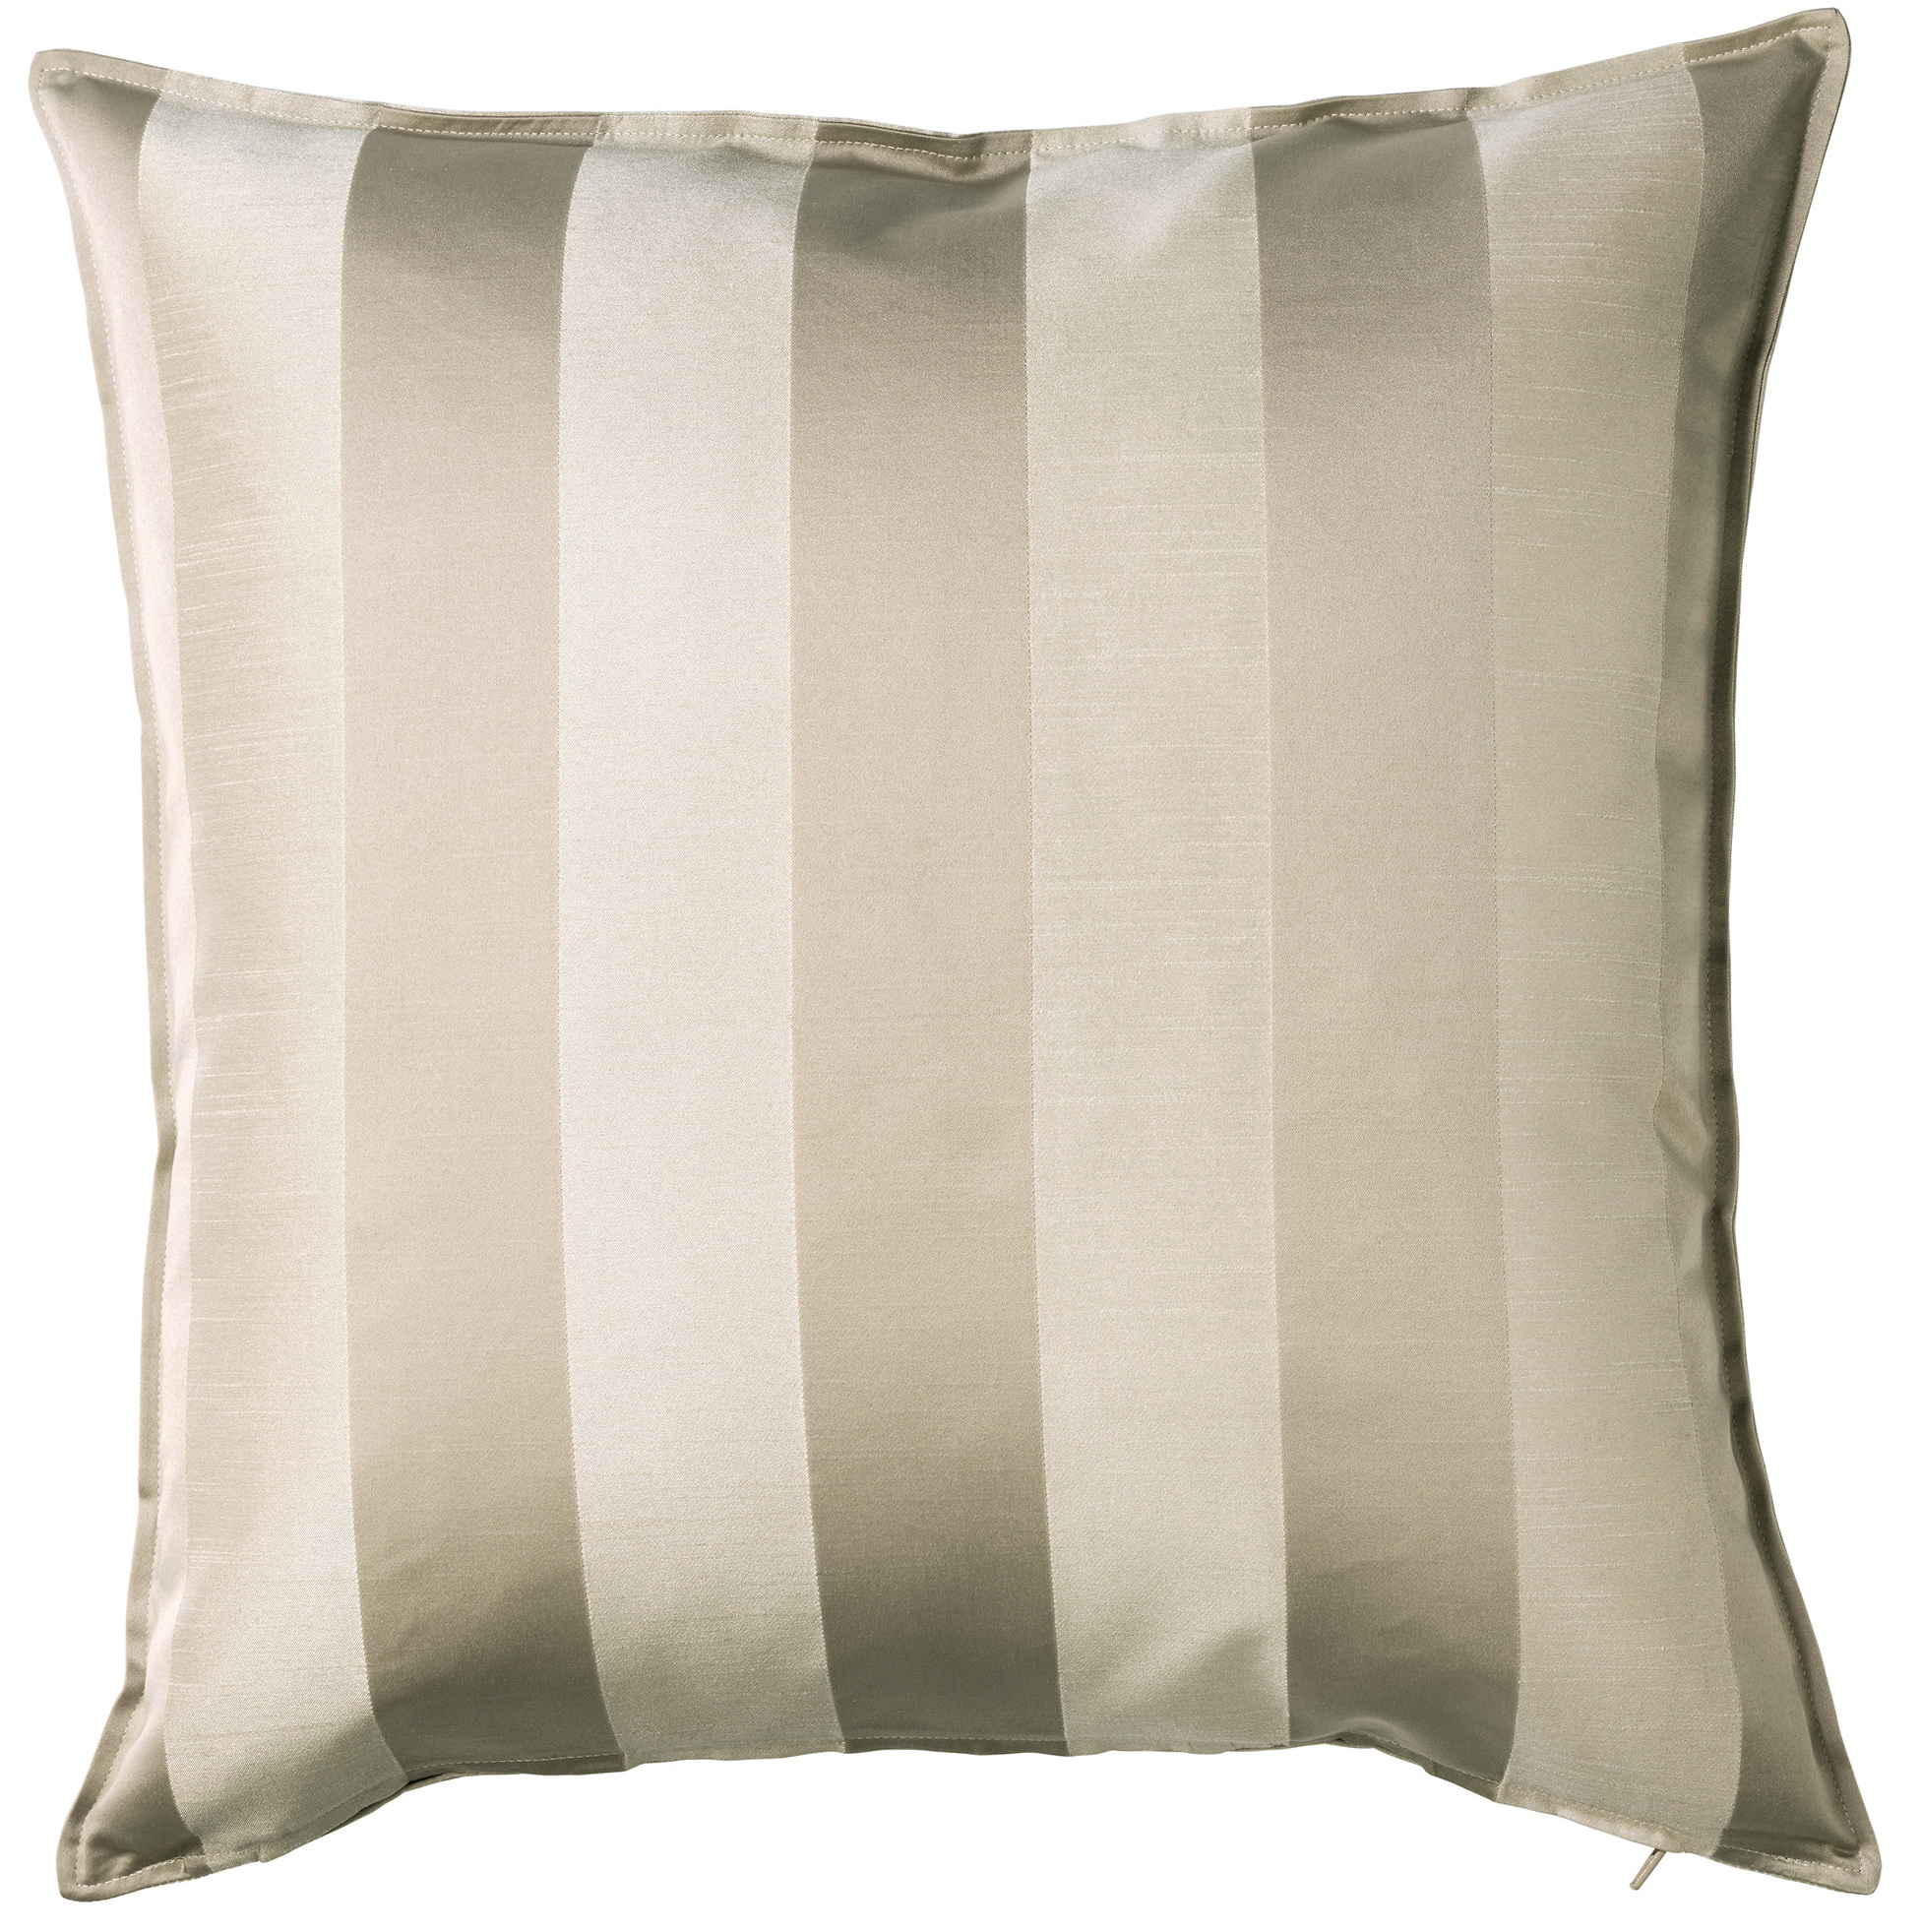 Cushion Covers Ikea Dublin Home Design Ideas